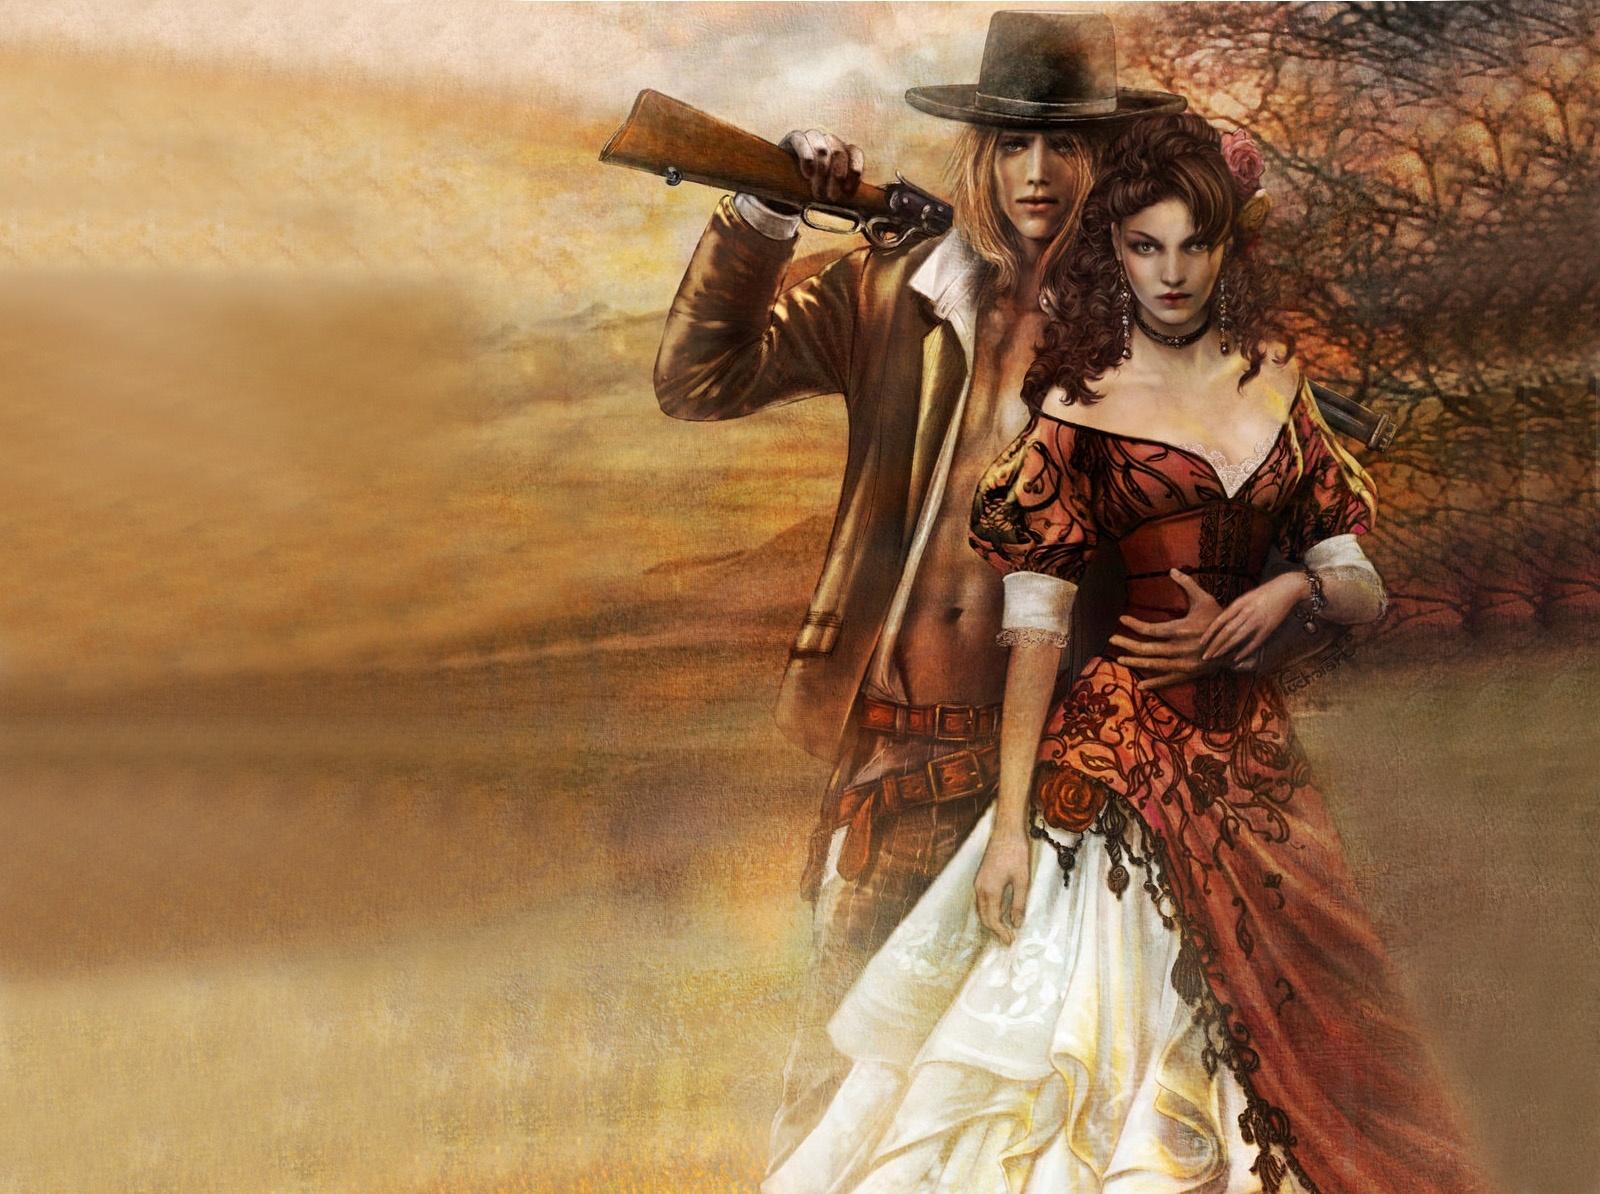 Amazing Wallpaper Love Fantasy - 206229-Dayane  Gallery_46845.jpg